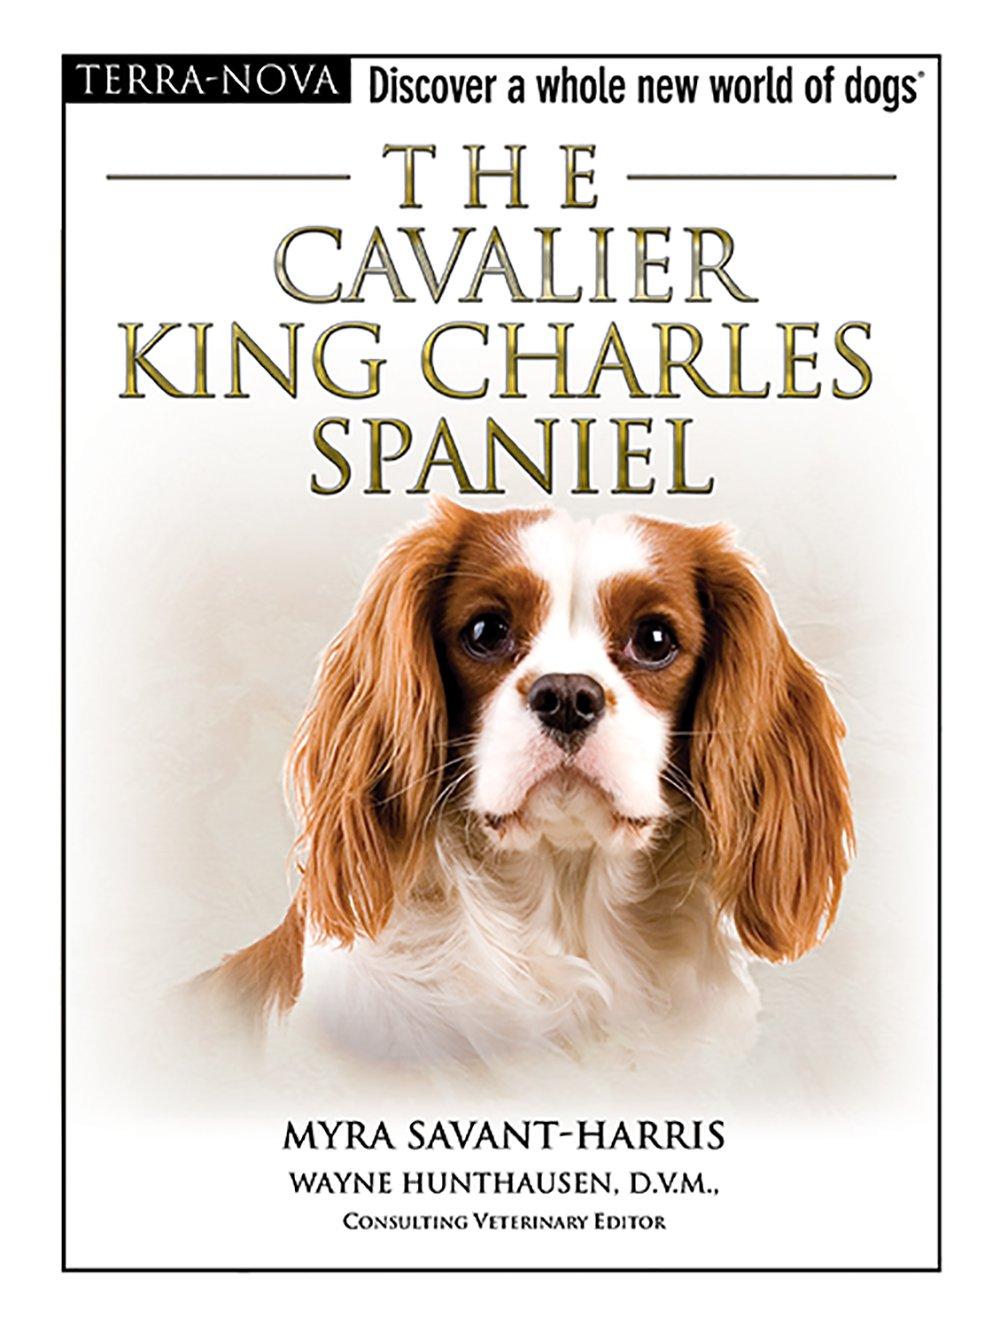 The cavalier king charles spaniel terra nova myra savant harris the cavalier king charles spaniel terra nova myra savant harris 9780793836796 amazon books nvjuhfo Choice Image